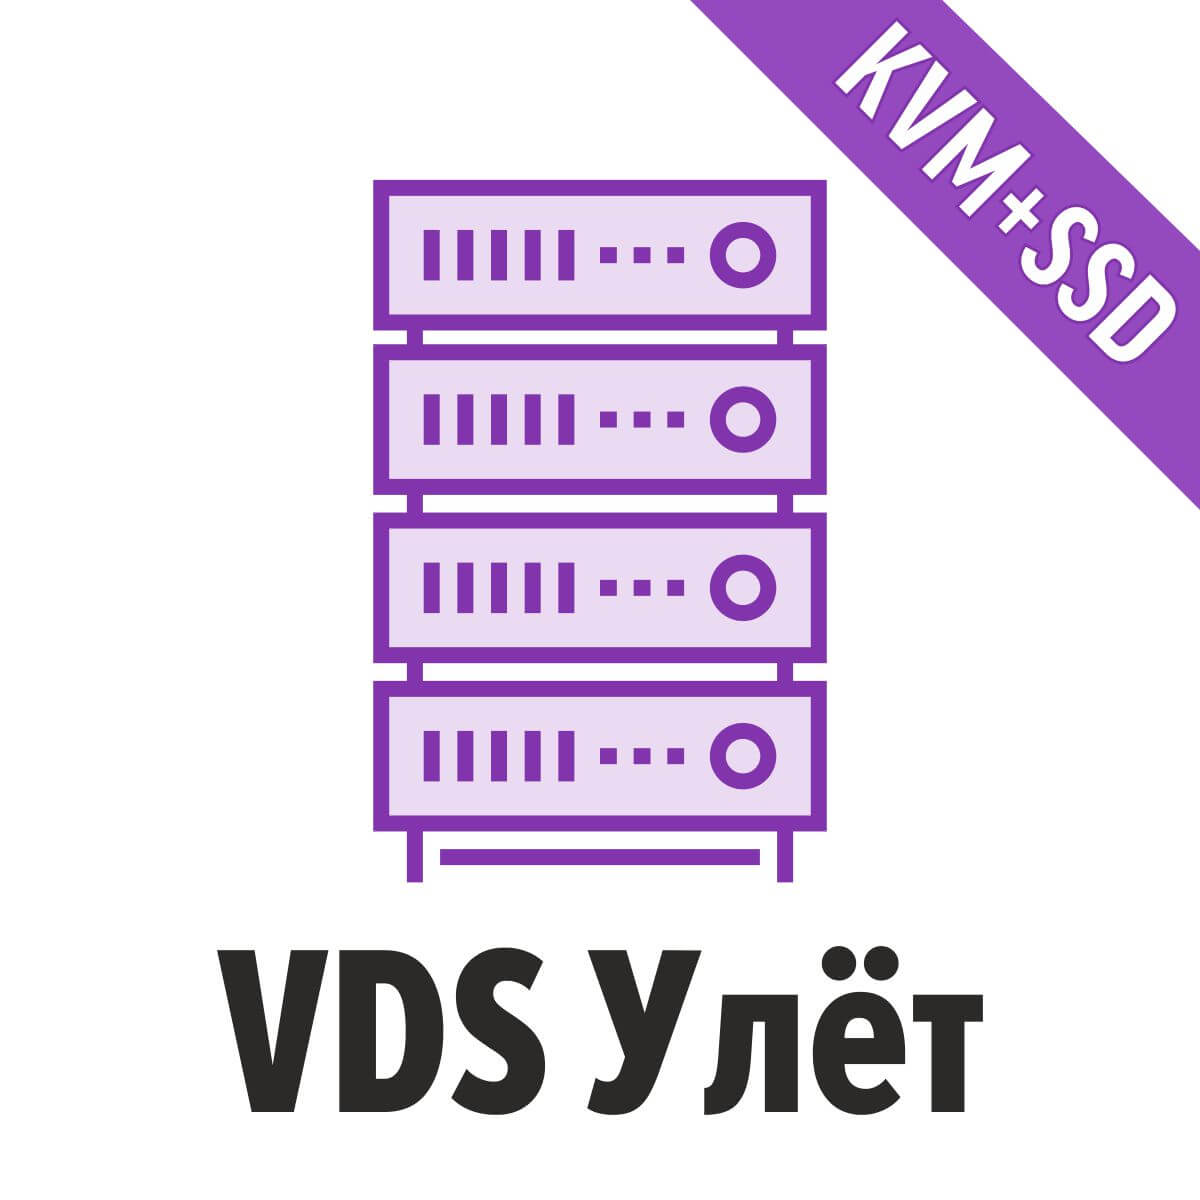 VDS Улёт (KVM, SSD, 6 Core, 6Gb RAM, 80Gb SSD)